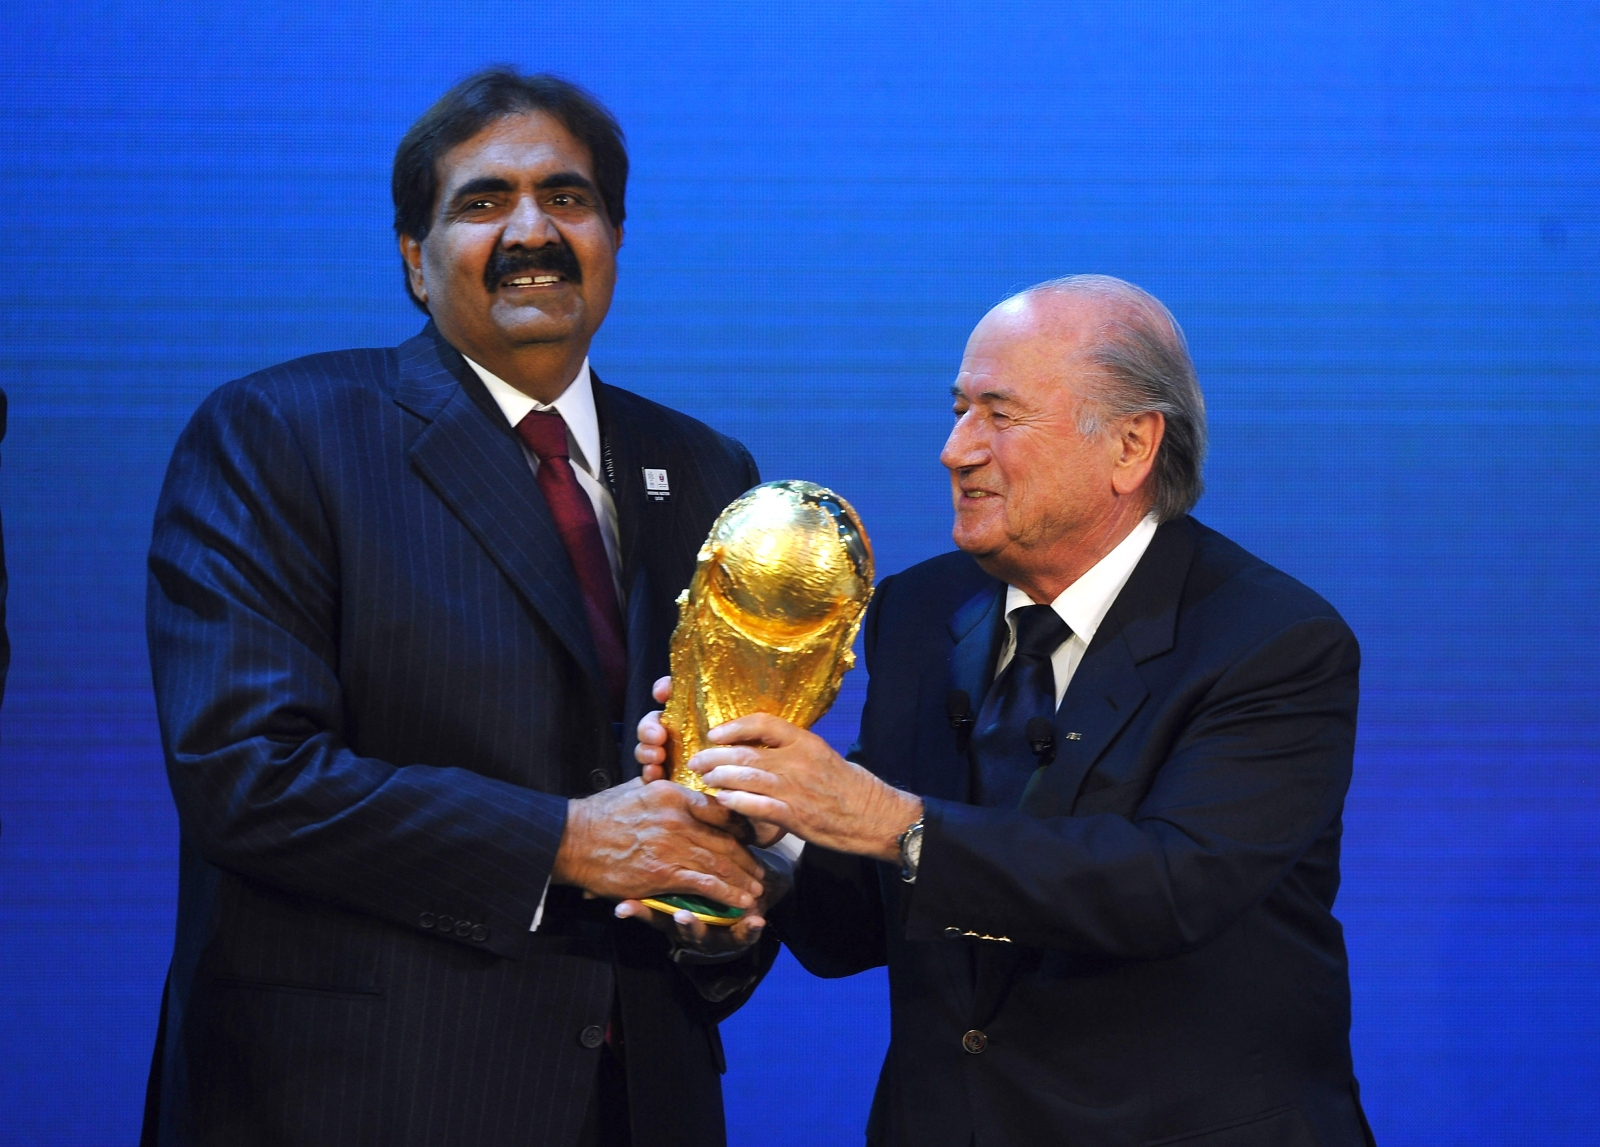 Report on alleged corruption in Qatar 2022 World Cup bid published